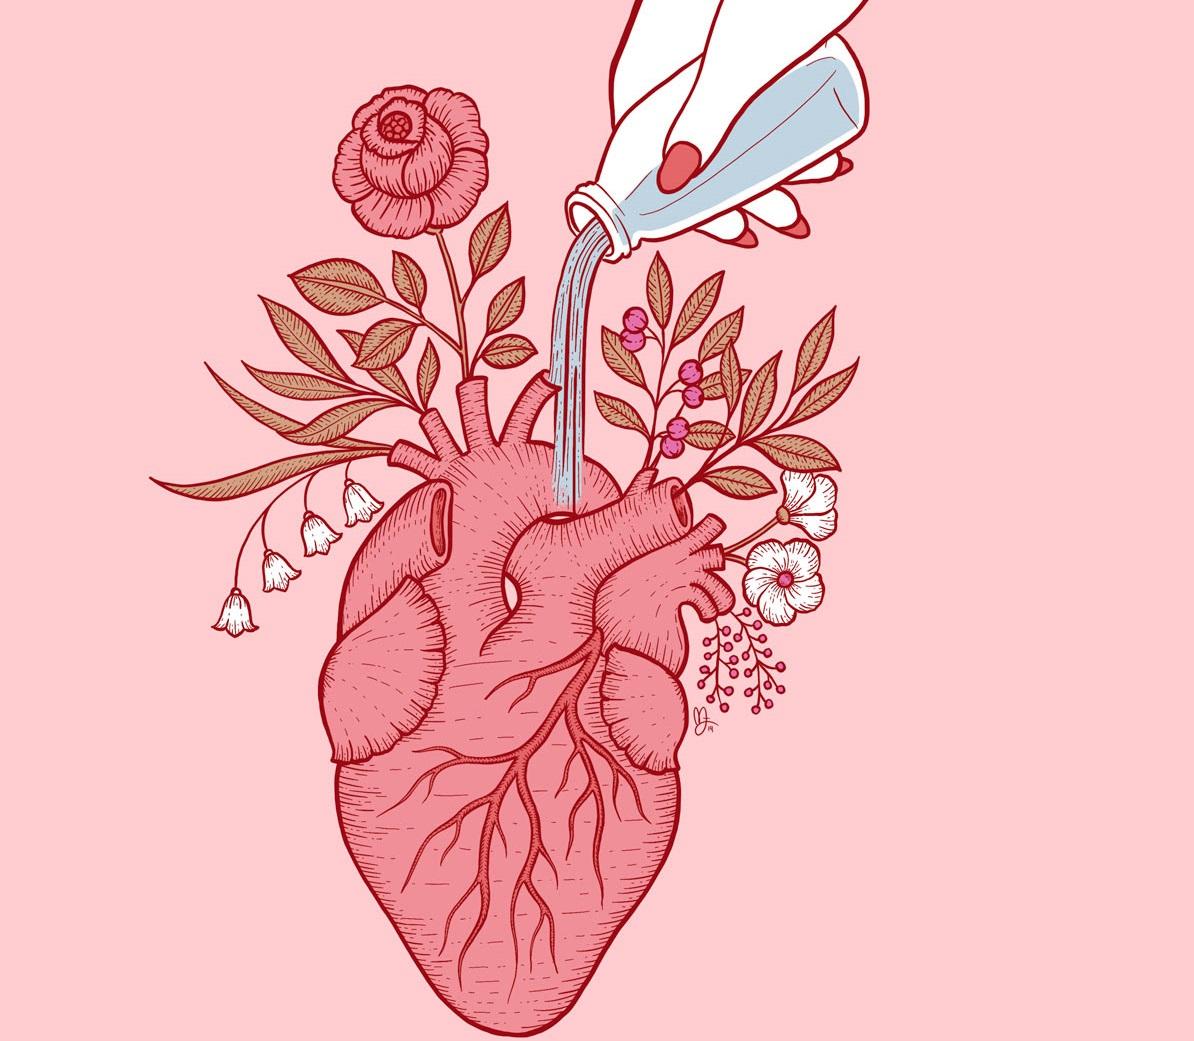 трансплантация сердце перфузия картинка